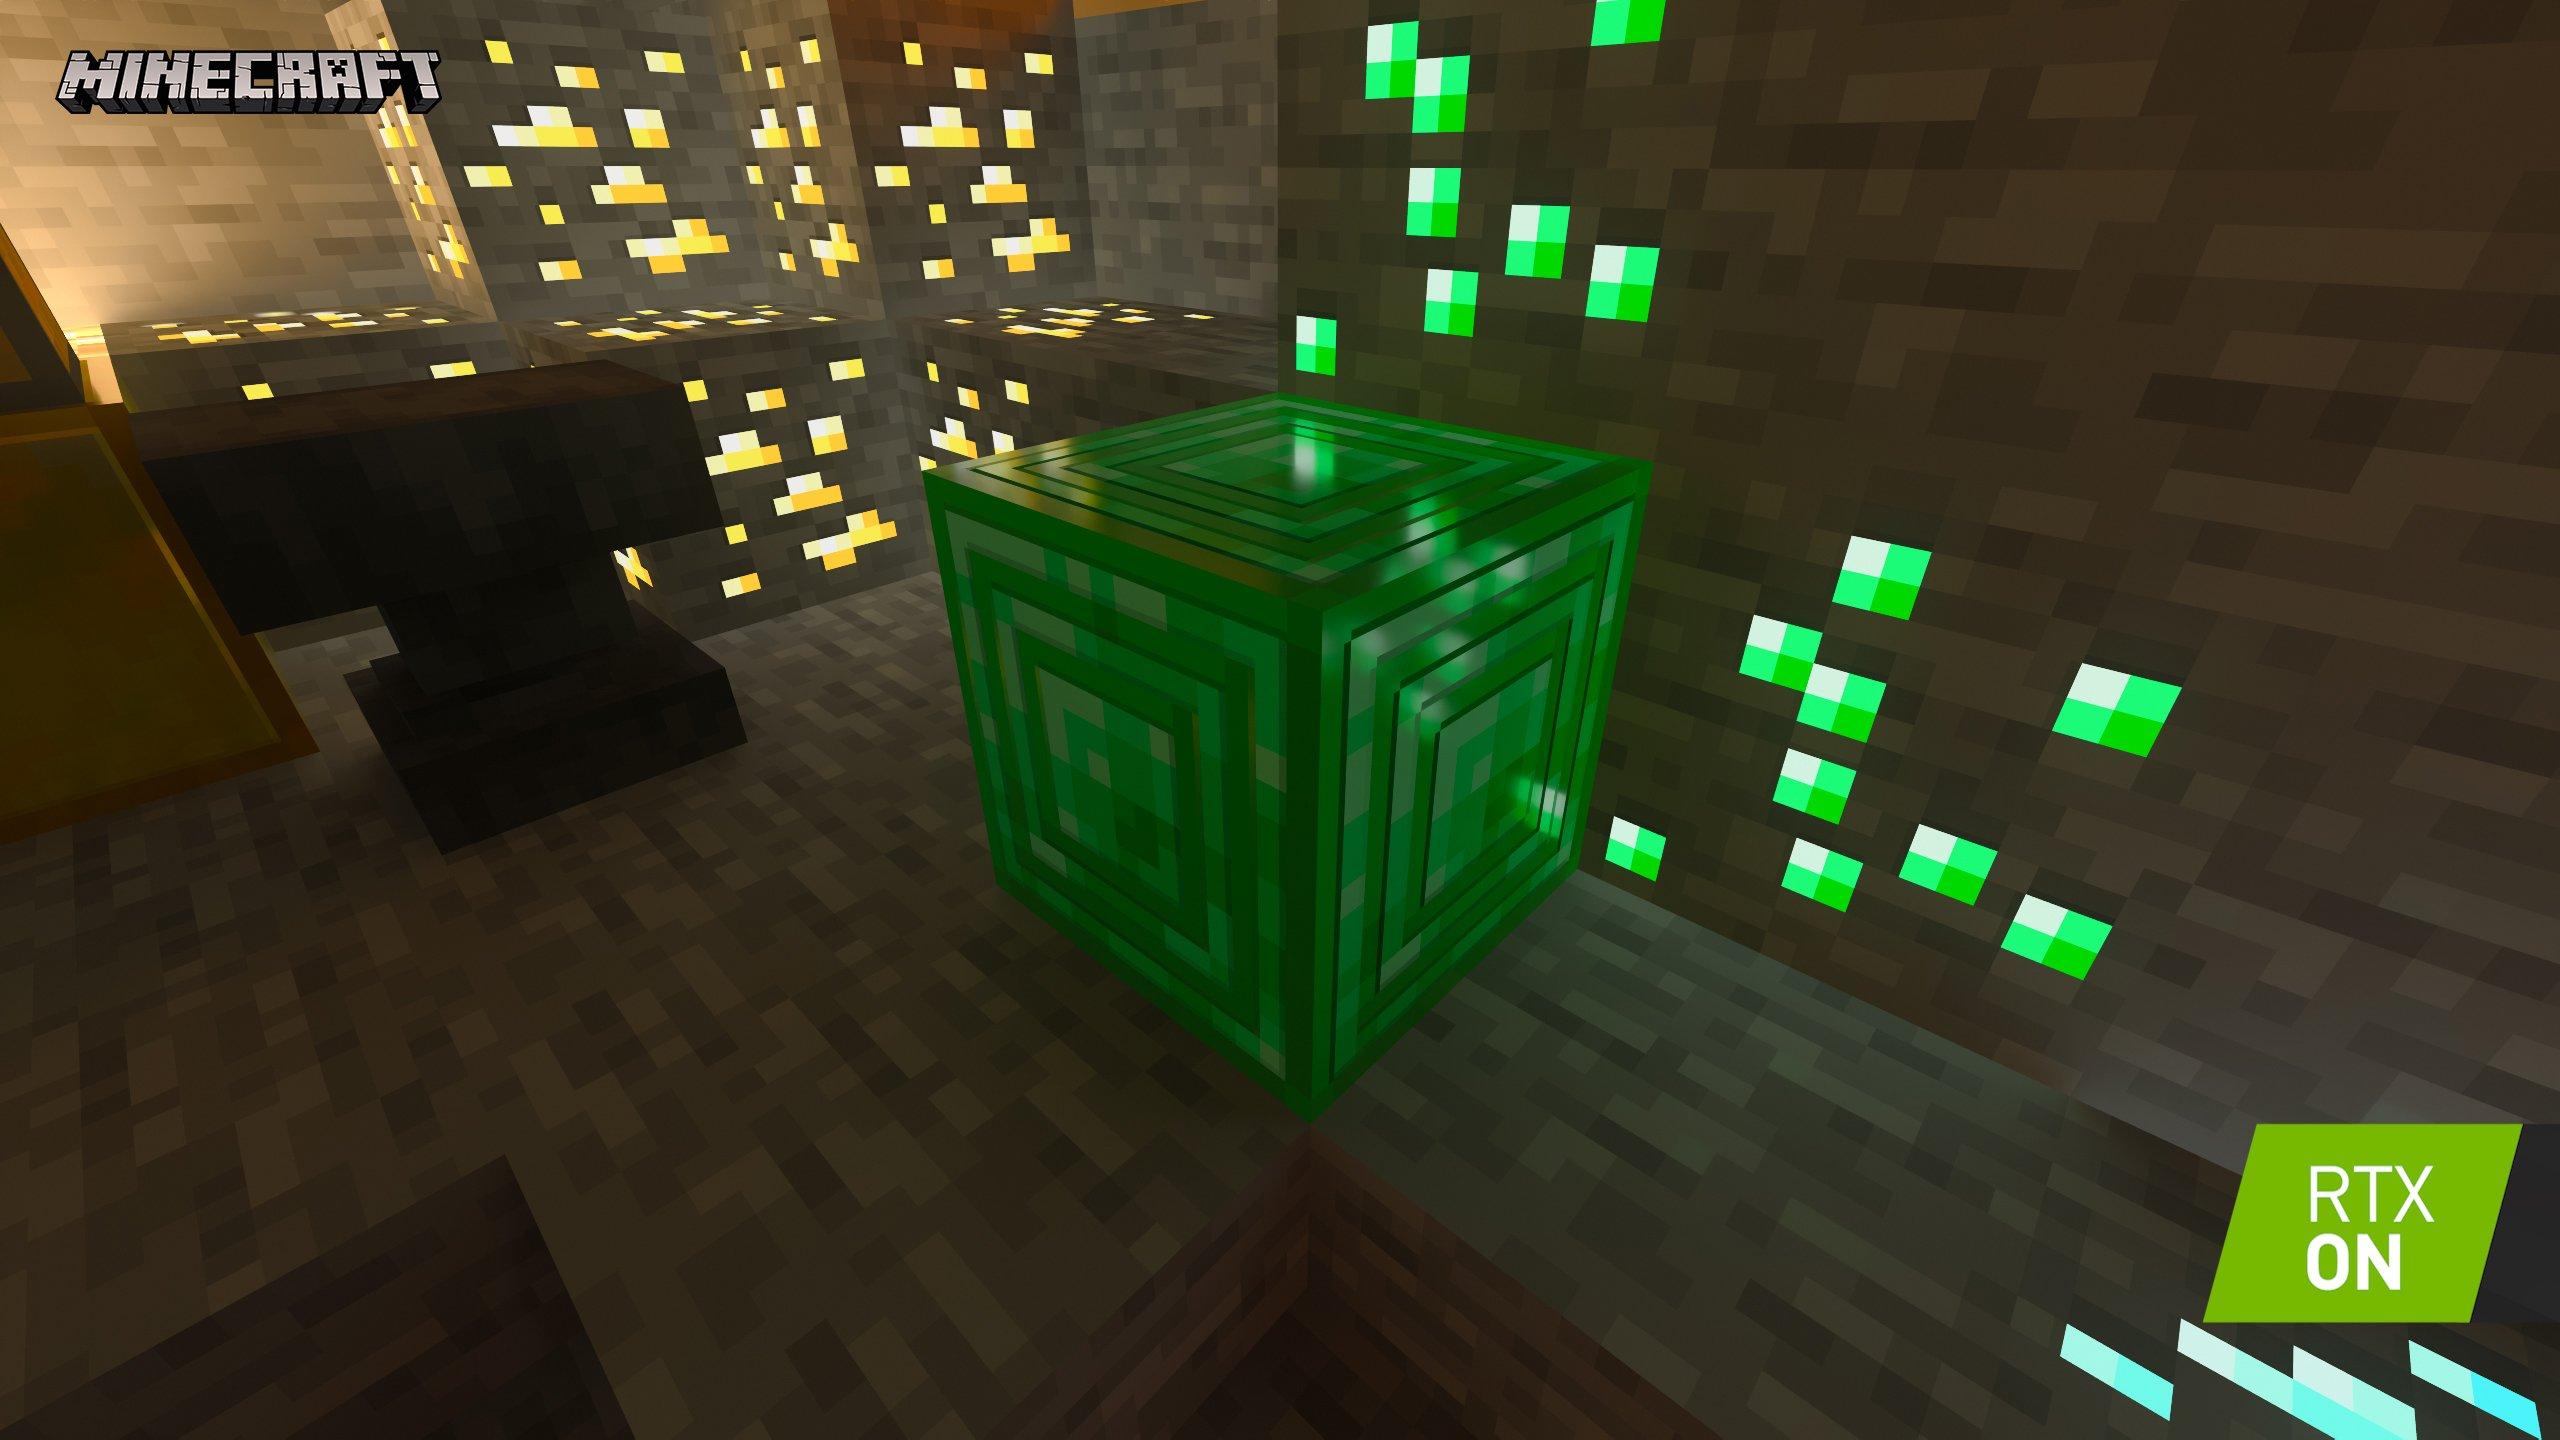 minecraft with rtx beta crystal palace emissive blocks 001 rtx on